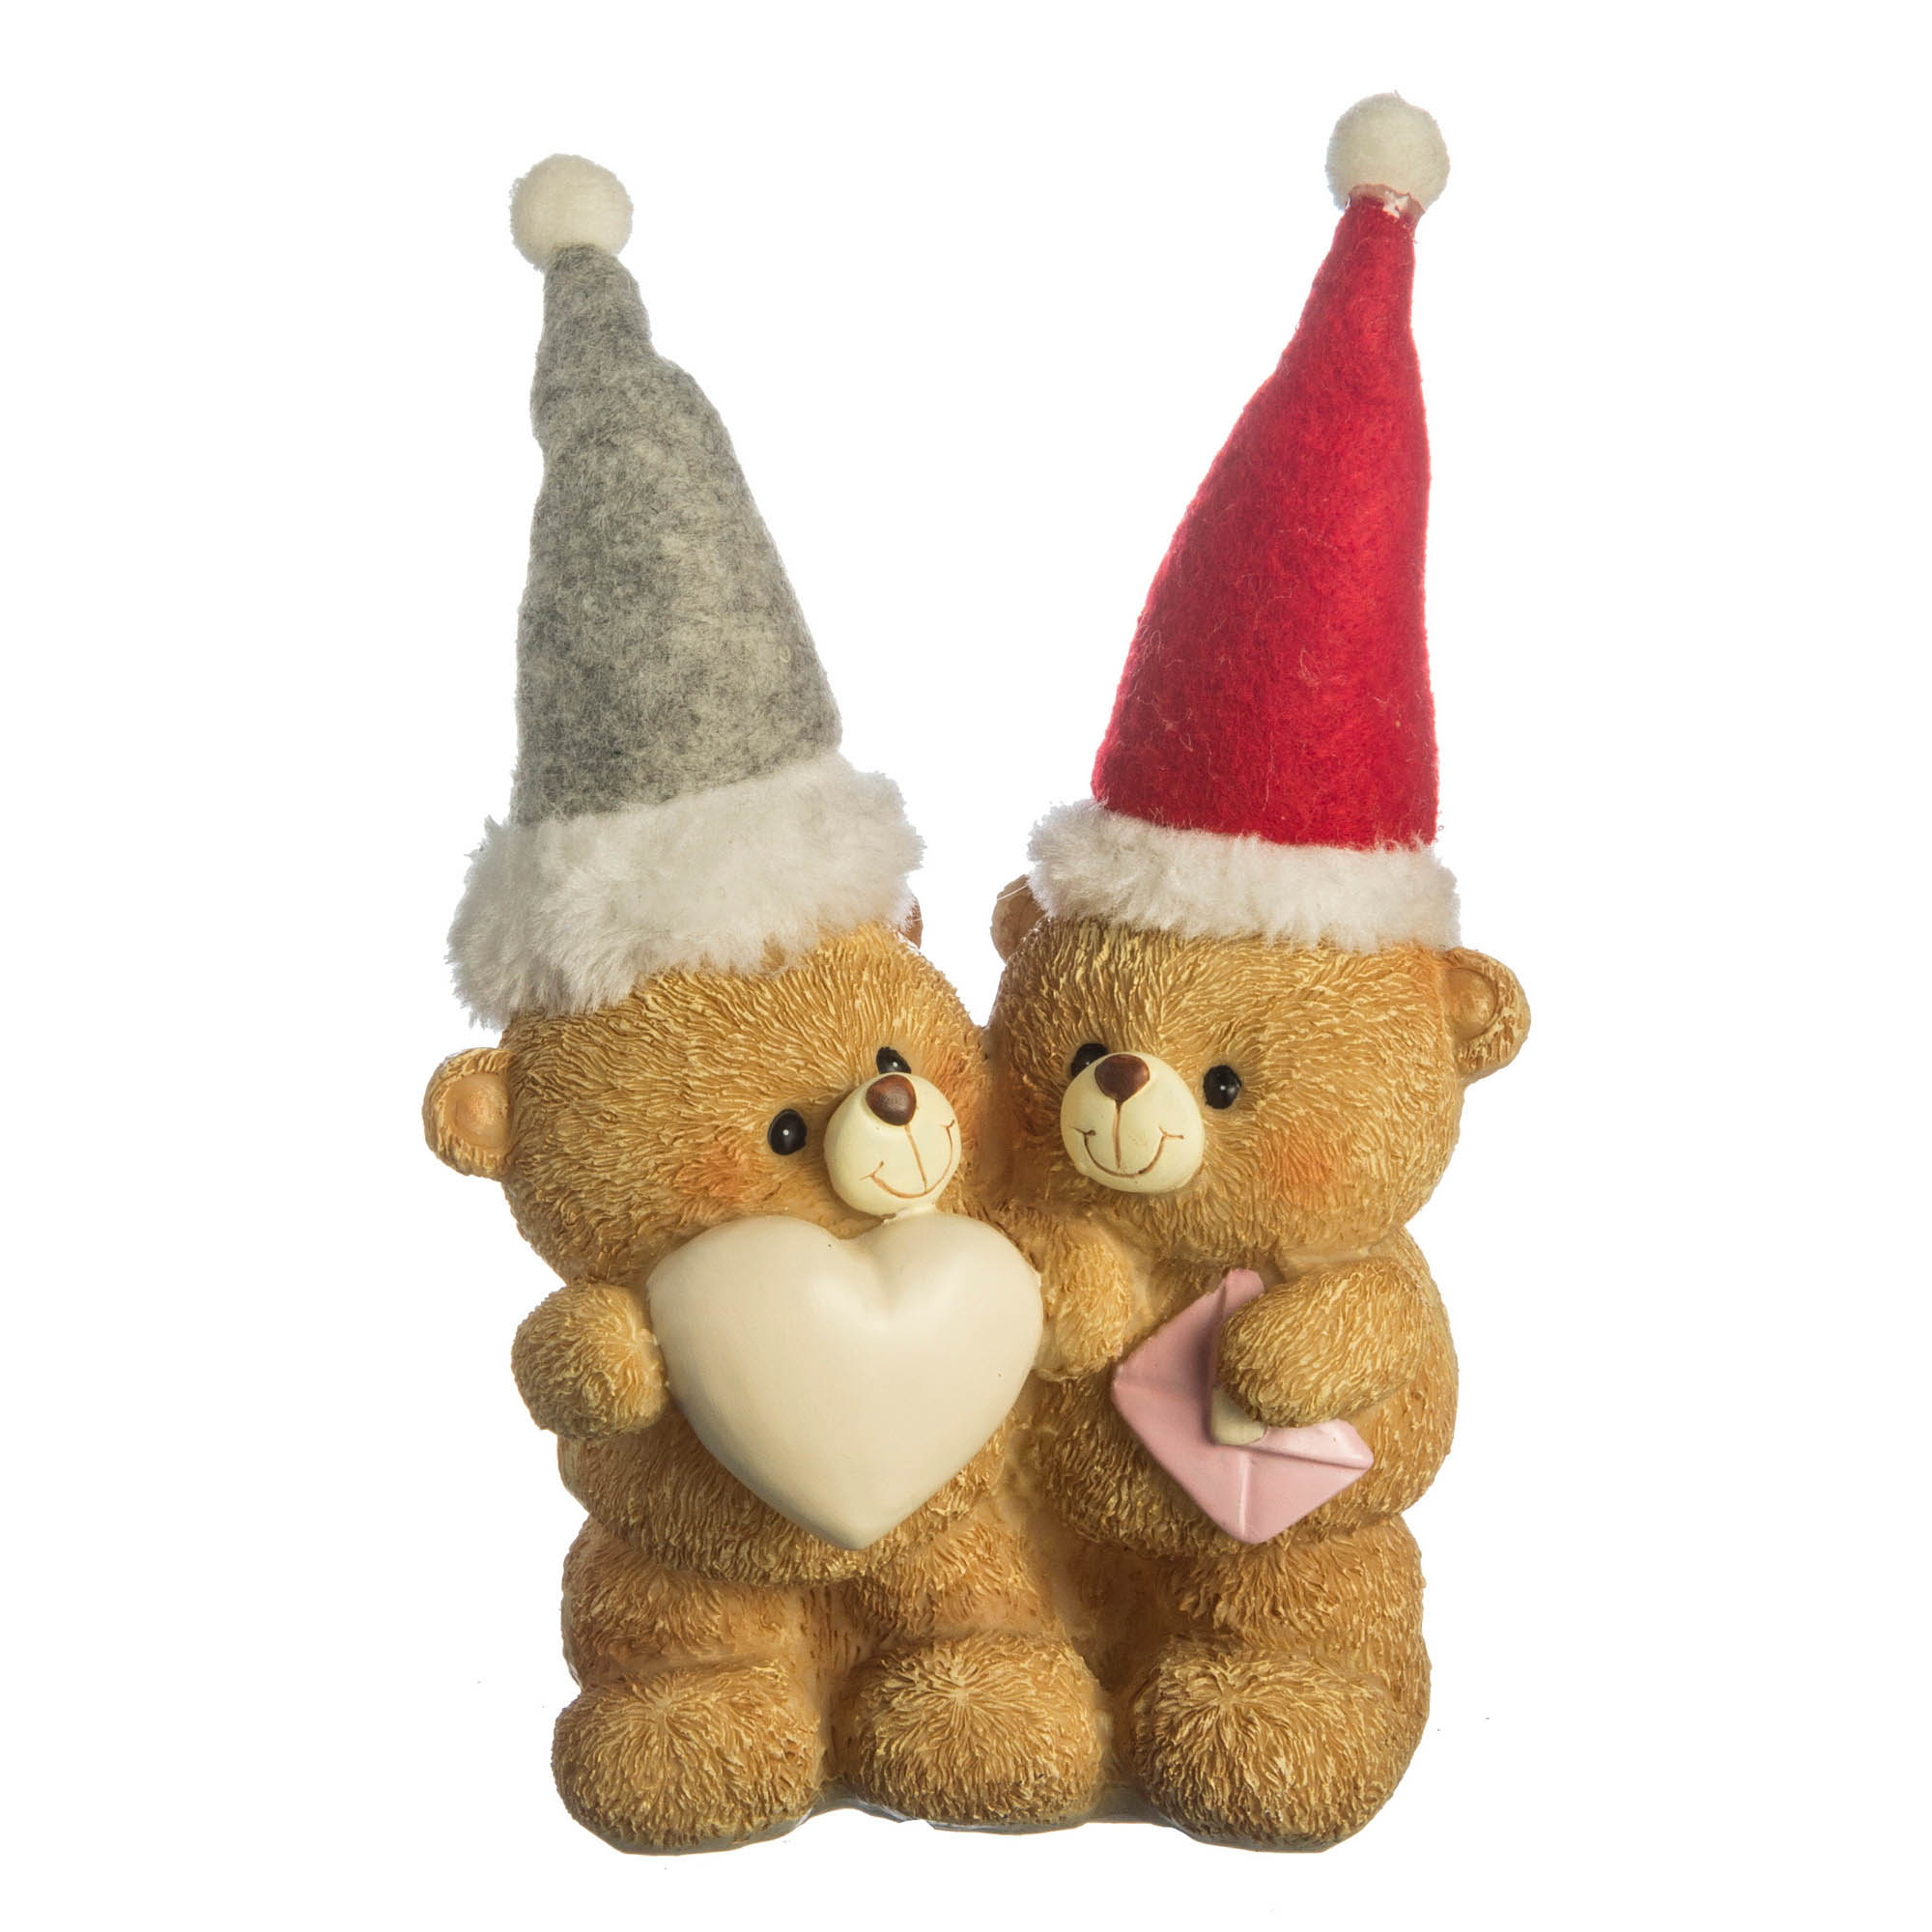 {} Lefard Интерьерная игрушка Медвежата (7х11х12 см) lefard интерьерная игрушка jan 5х6х13 см